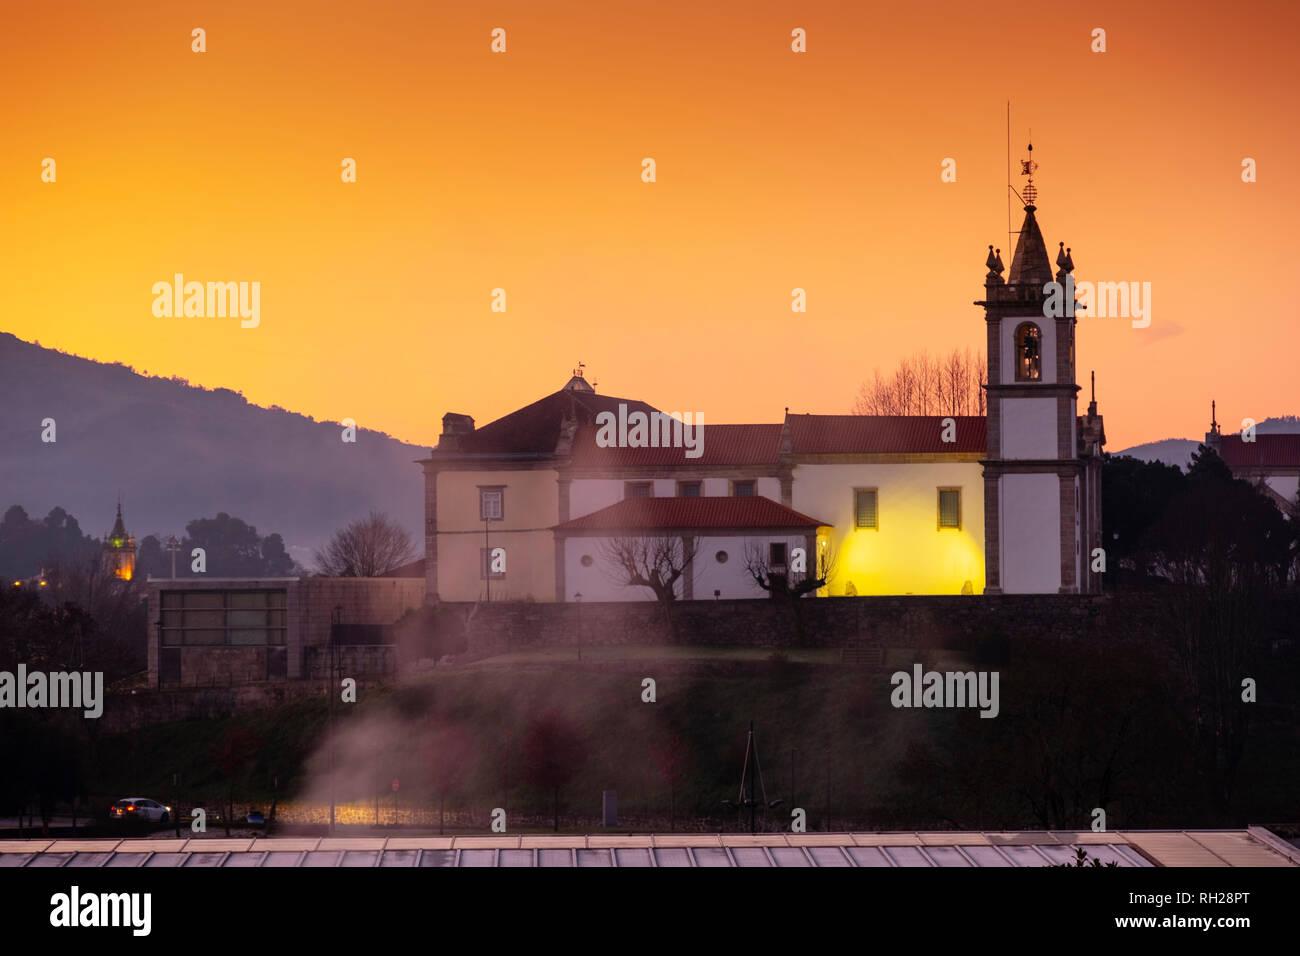 Mayor church at sunrise, Village Arcos de Valdevez. Viana do Castelo, Alto Minho region. Northern Portugal, Europe - Stock Image